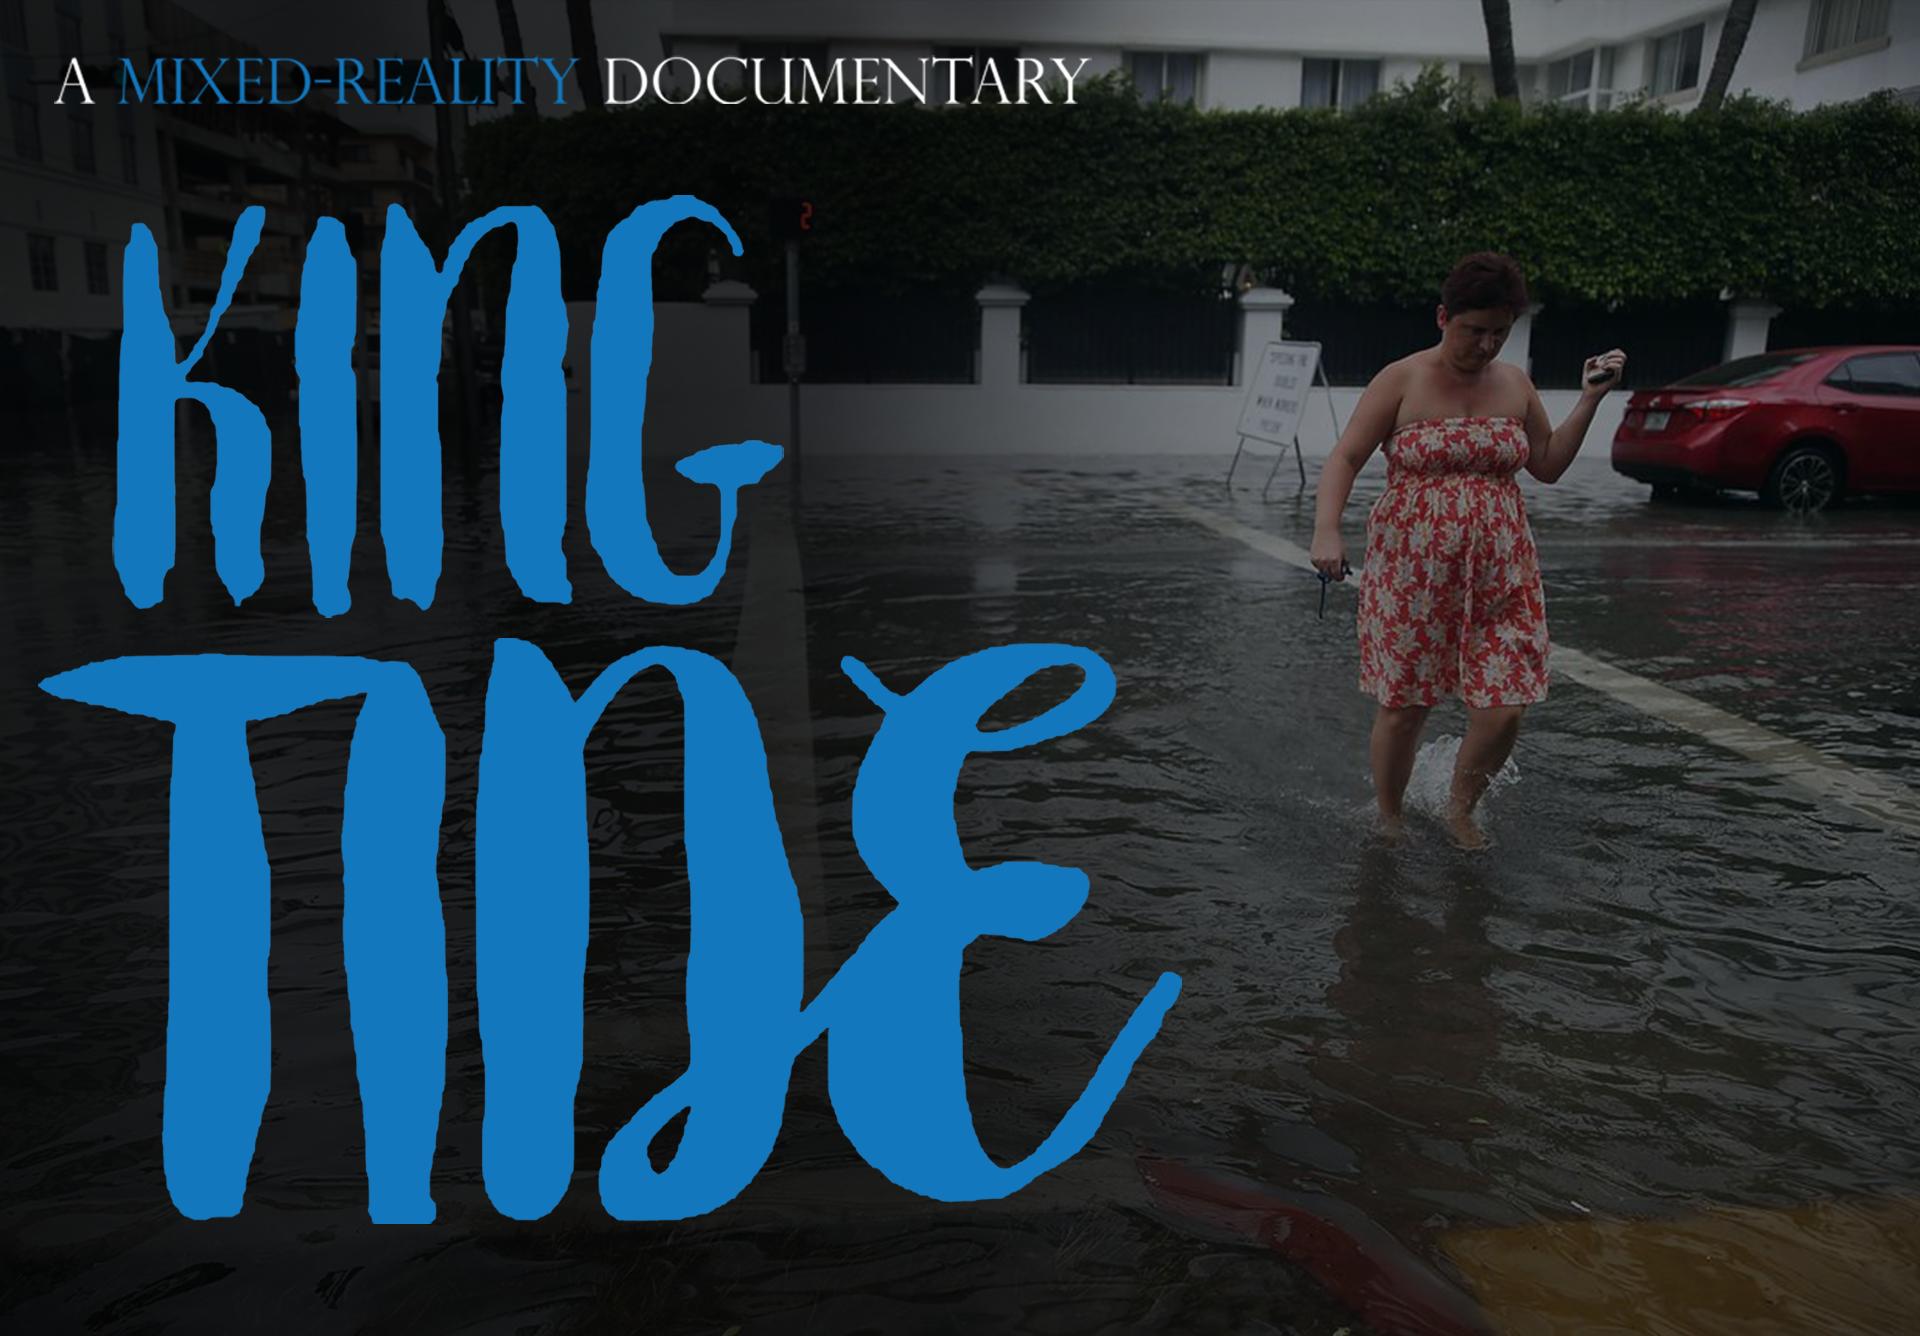 King Tide Title Treatment (1080p).png